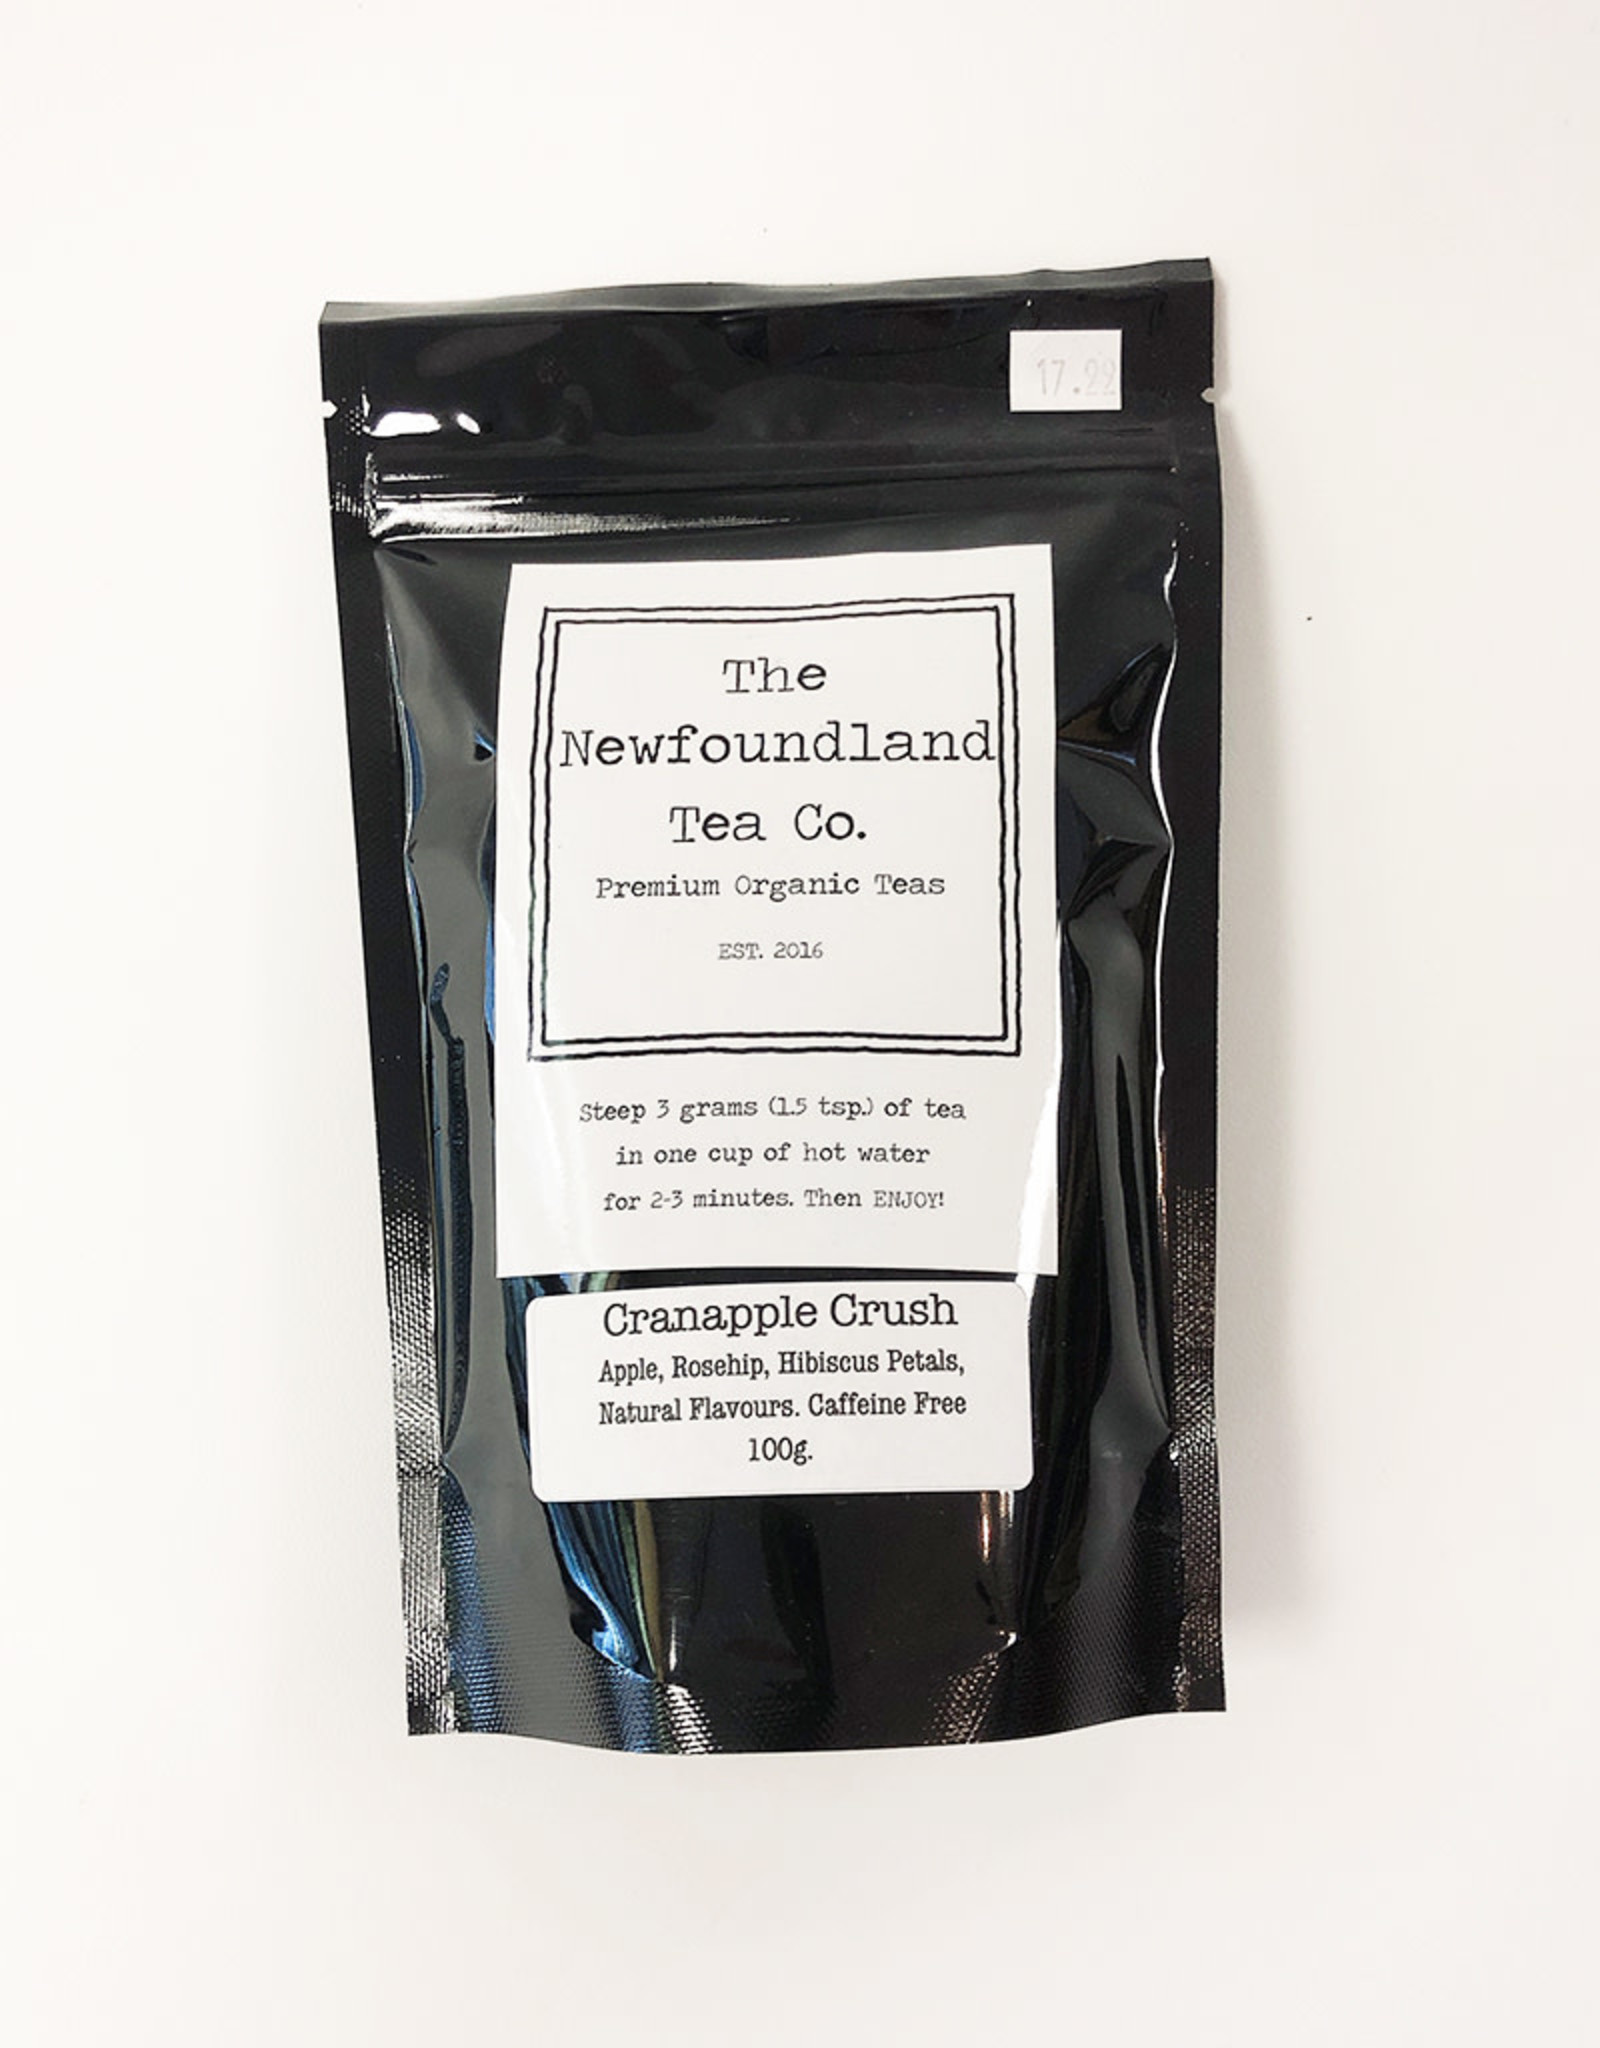 Newfoundland Tea Co. Newfoundland Tea Co. - Cranapple Crush